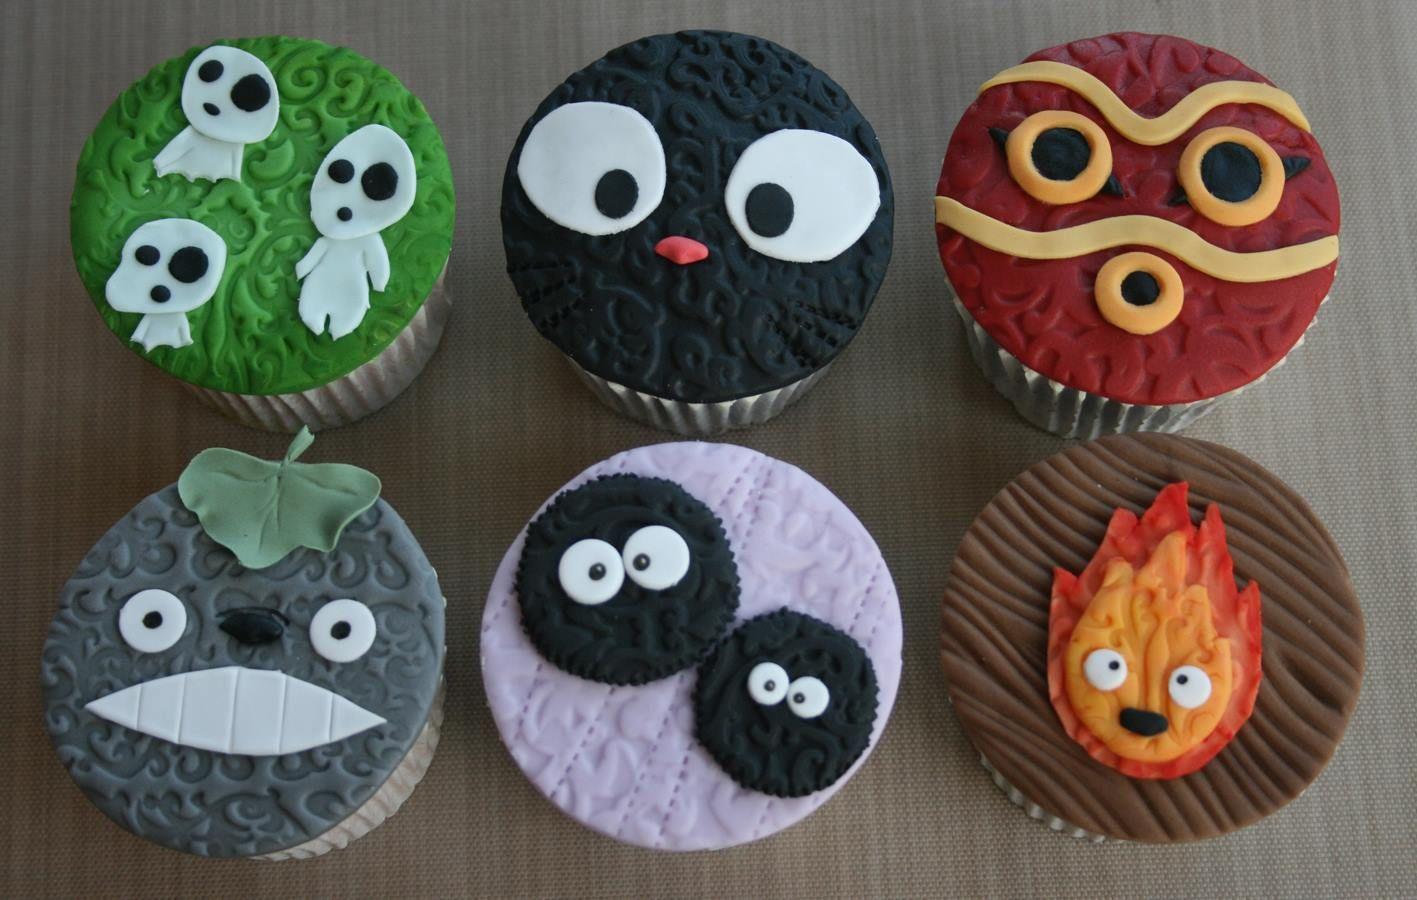 My Neighbor Totoro Cake Decorations